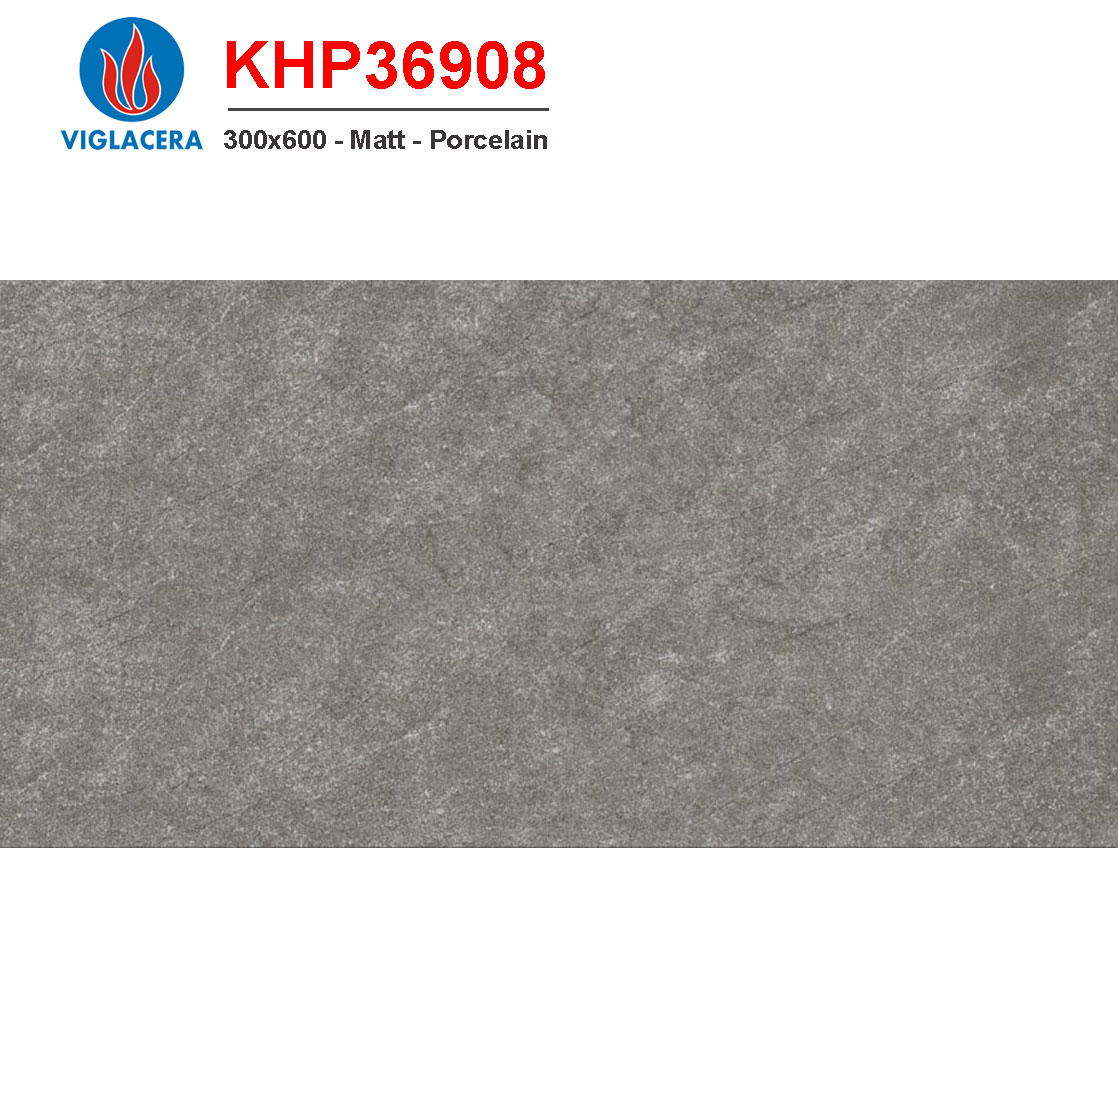 Gạch ốp tường 300x600 men Matt Viglacera KHP36908 giá rẻ